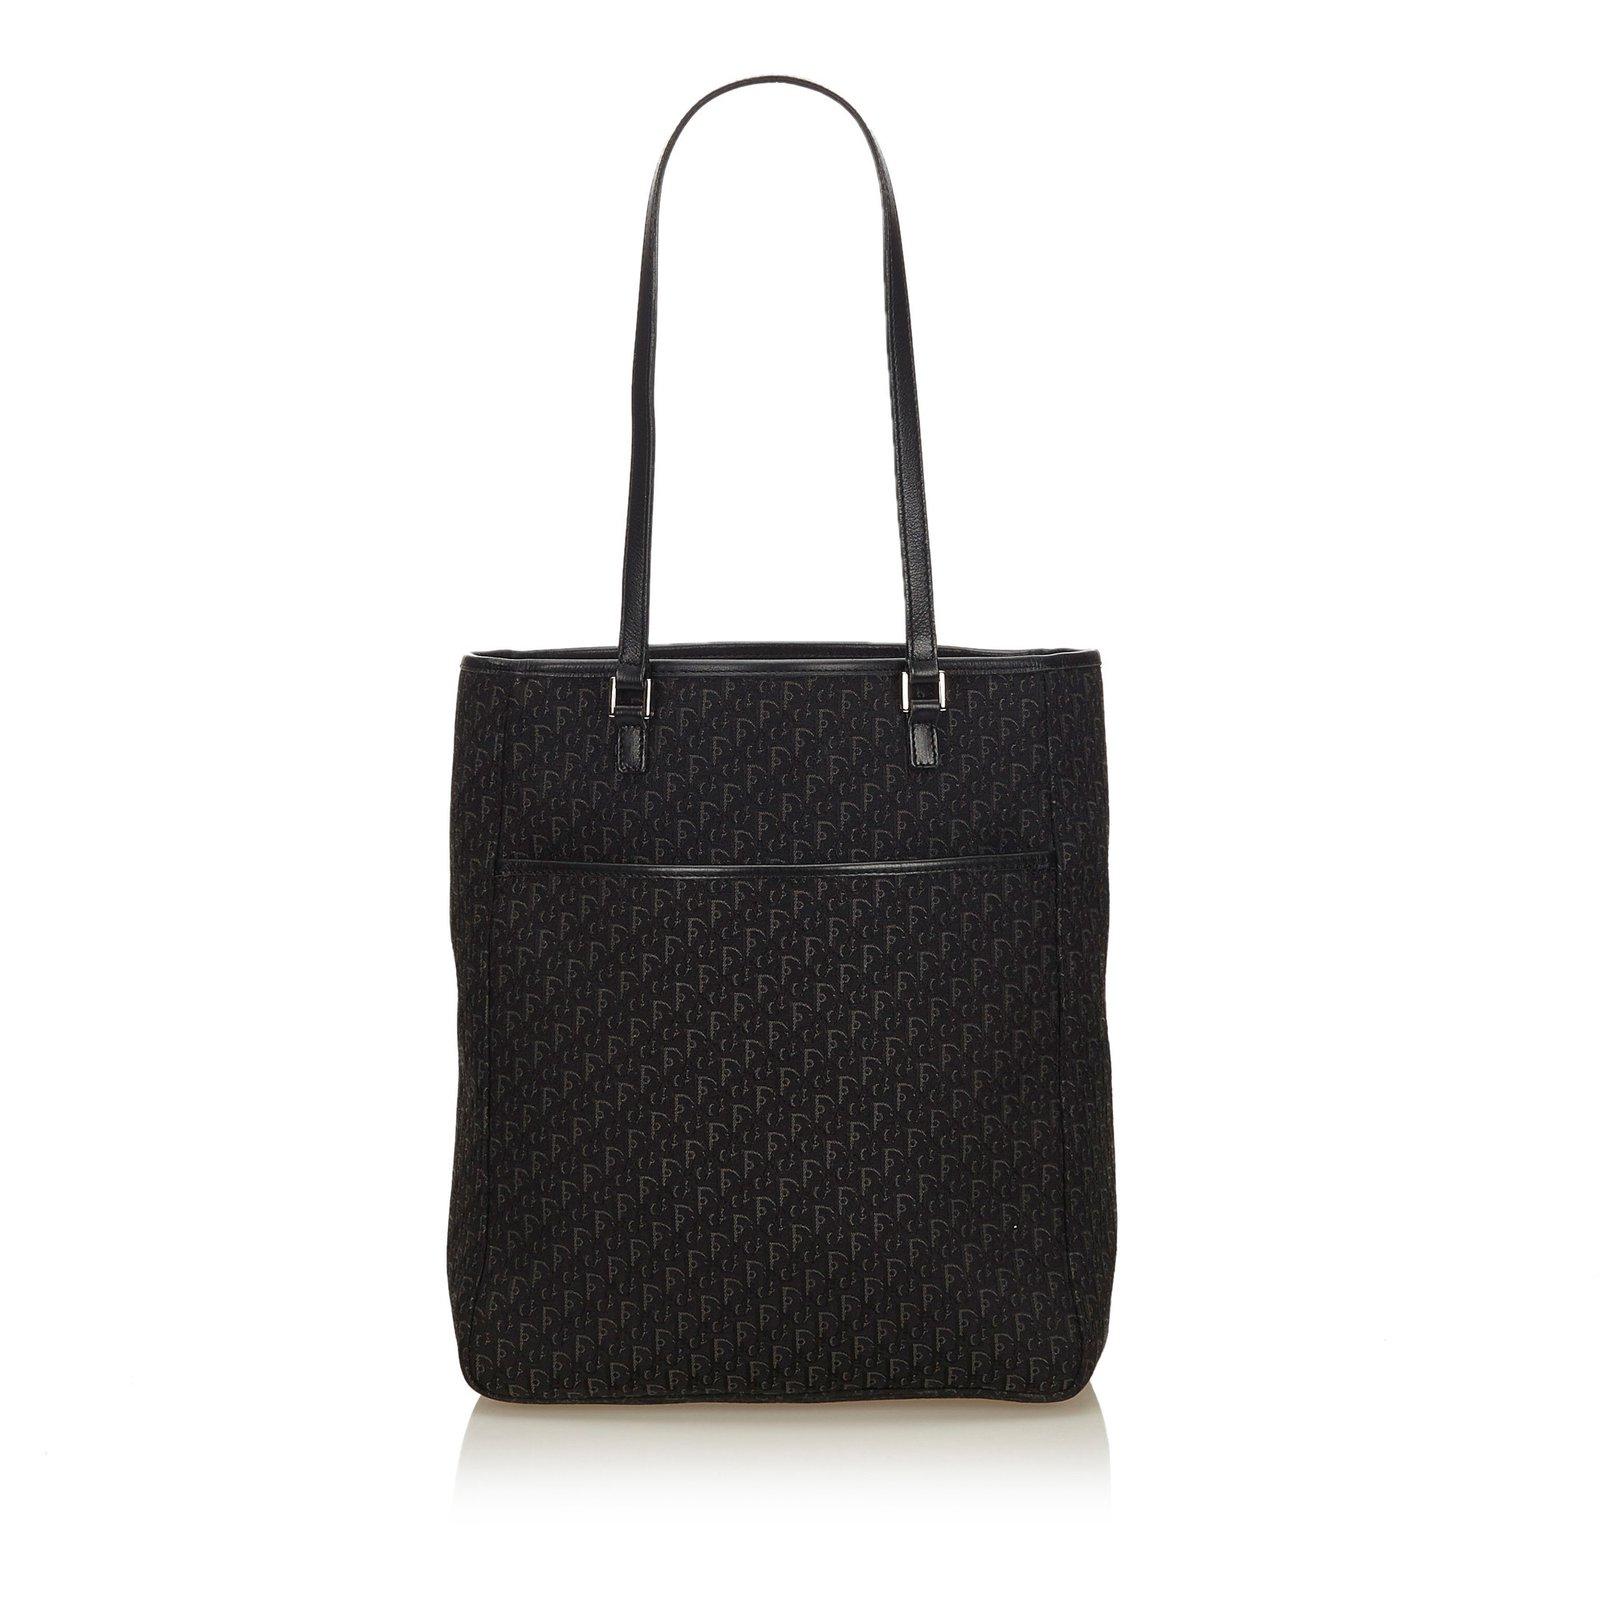 fe5c9965ccc6 Dior Oblique Canvas Tote Bag Totes Leather